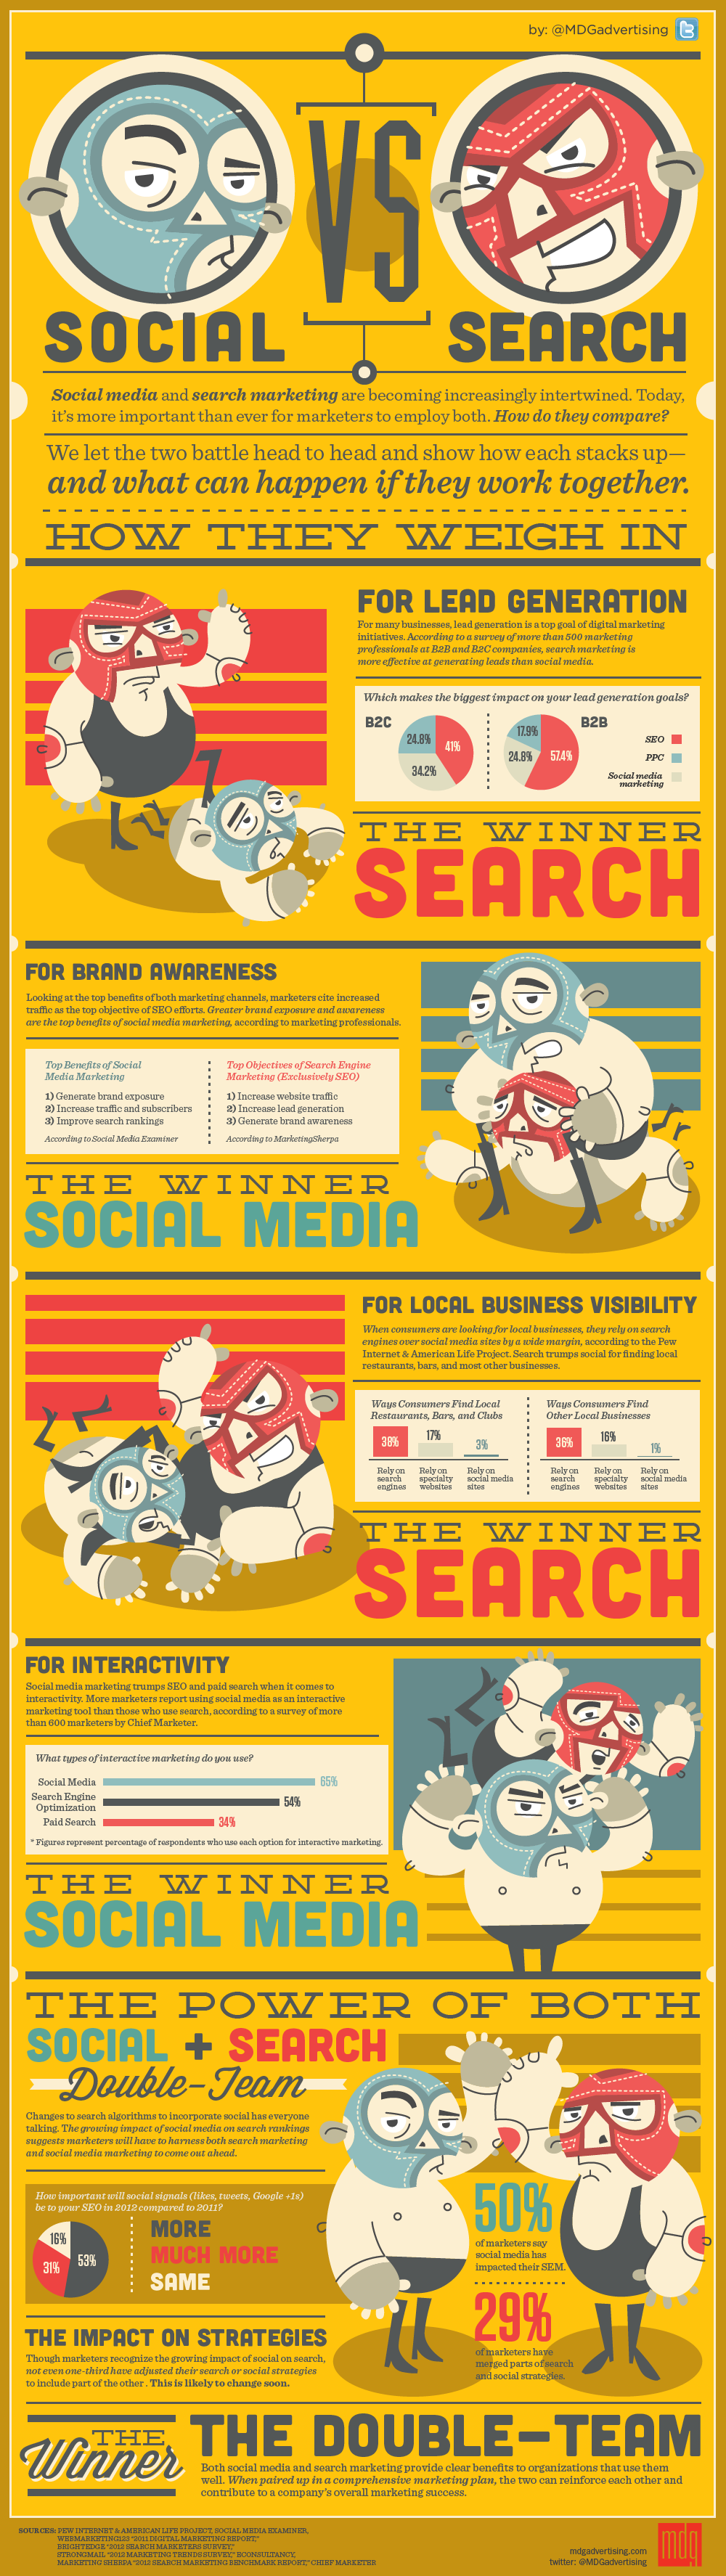 Social vs. Search